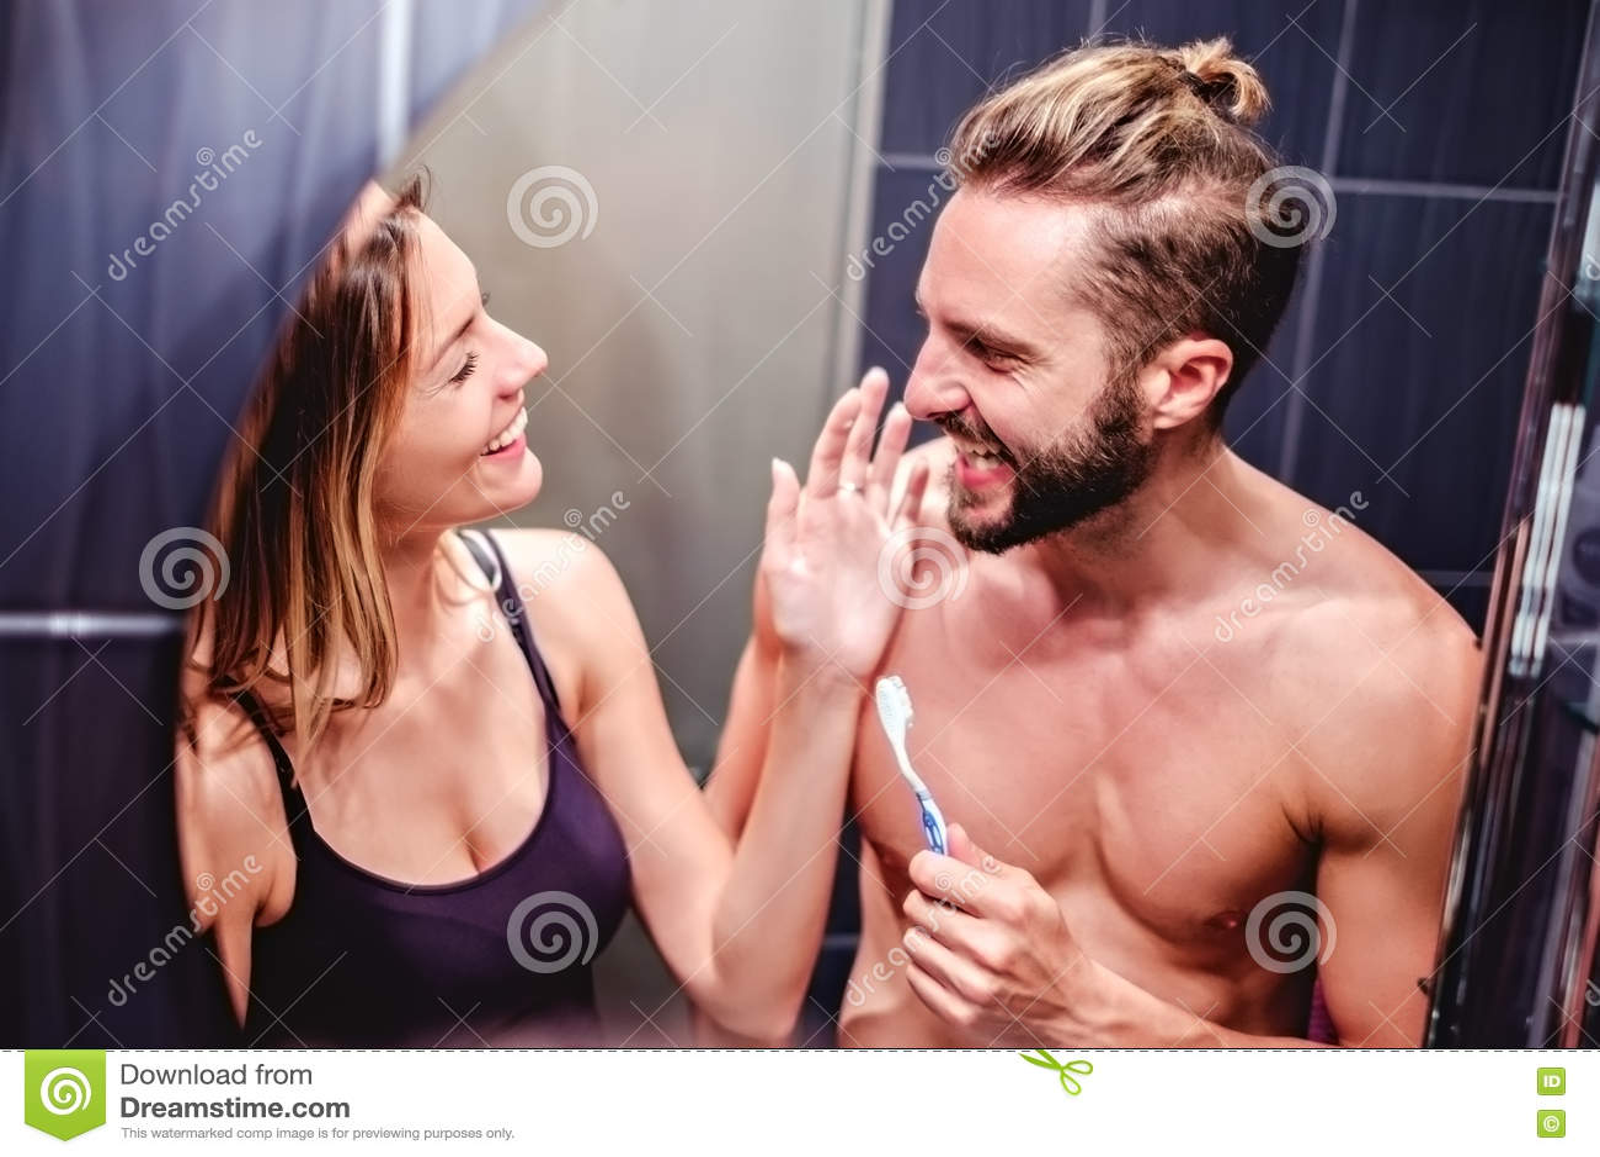 Couple Brushing Teeth And Having Fun Stock Photo Image Of